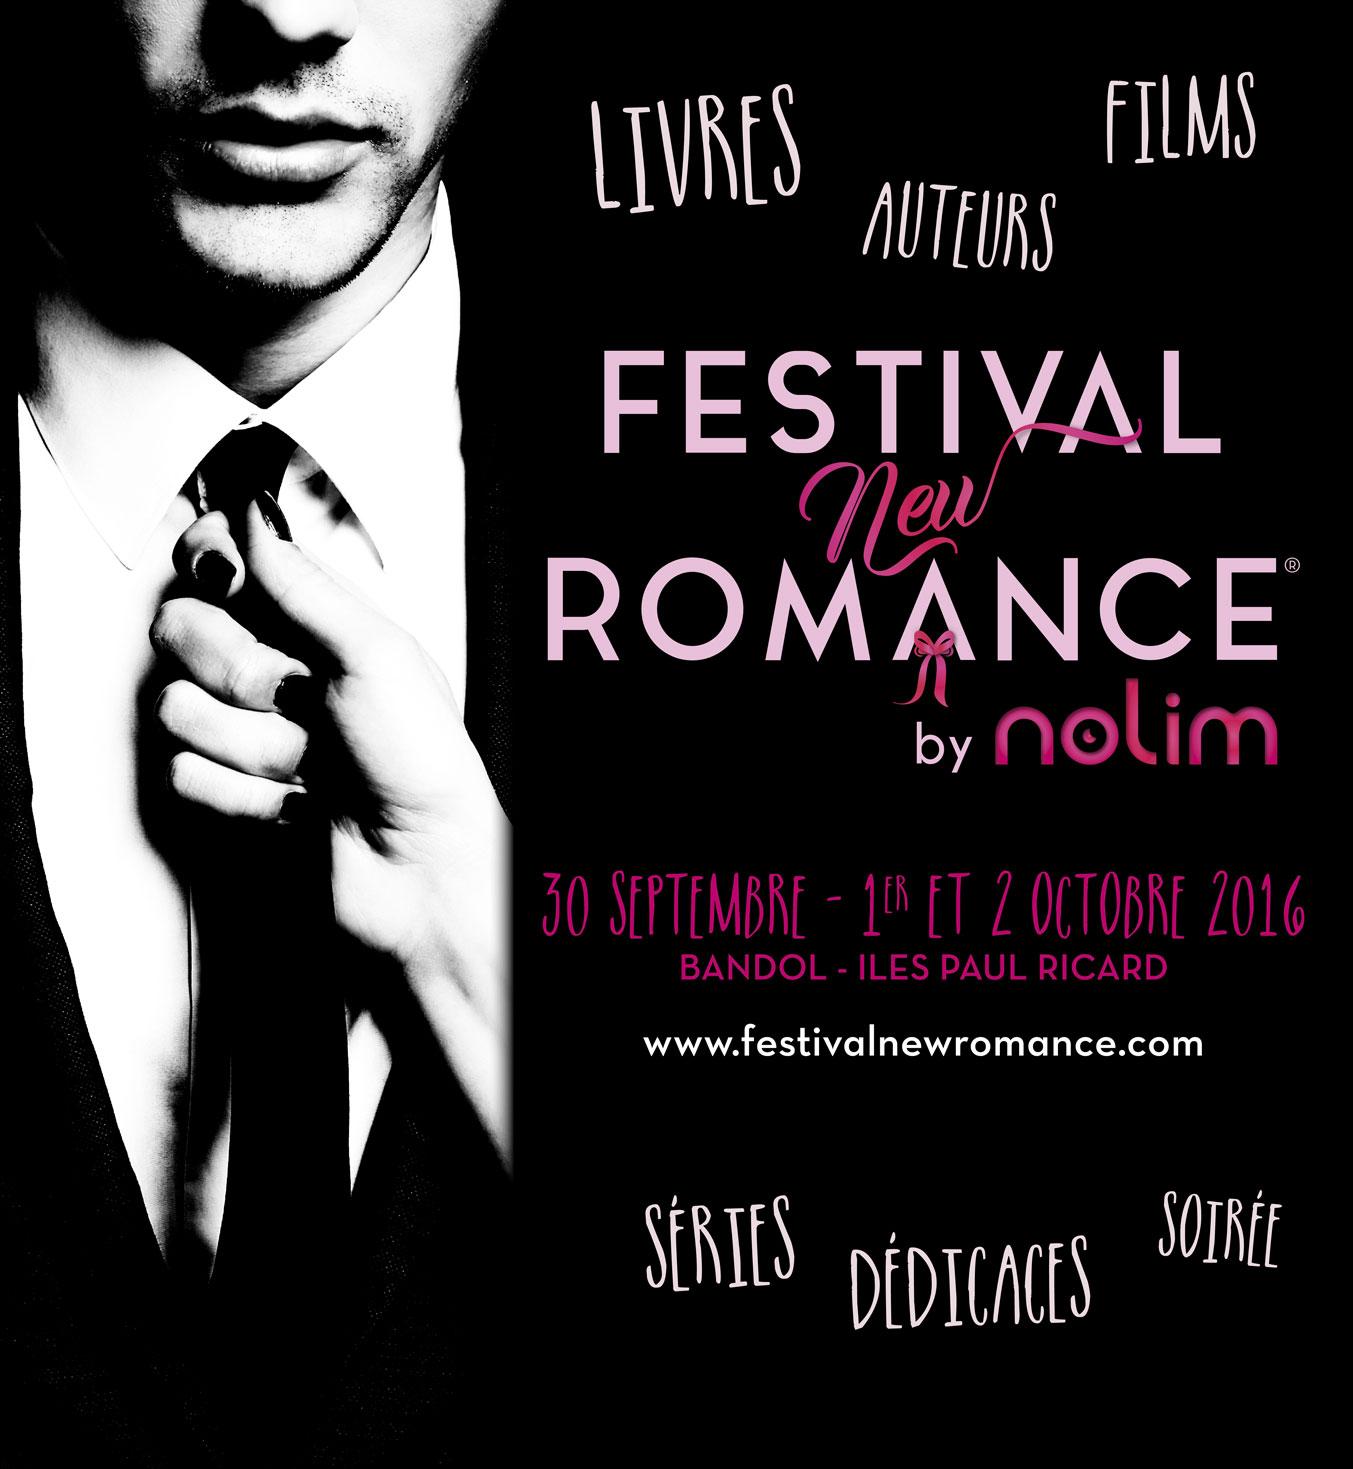 FESTIVAL NEW ROMANCE BY NOLIM BANDOL